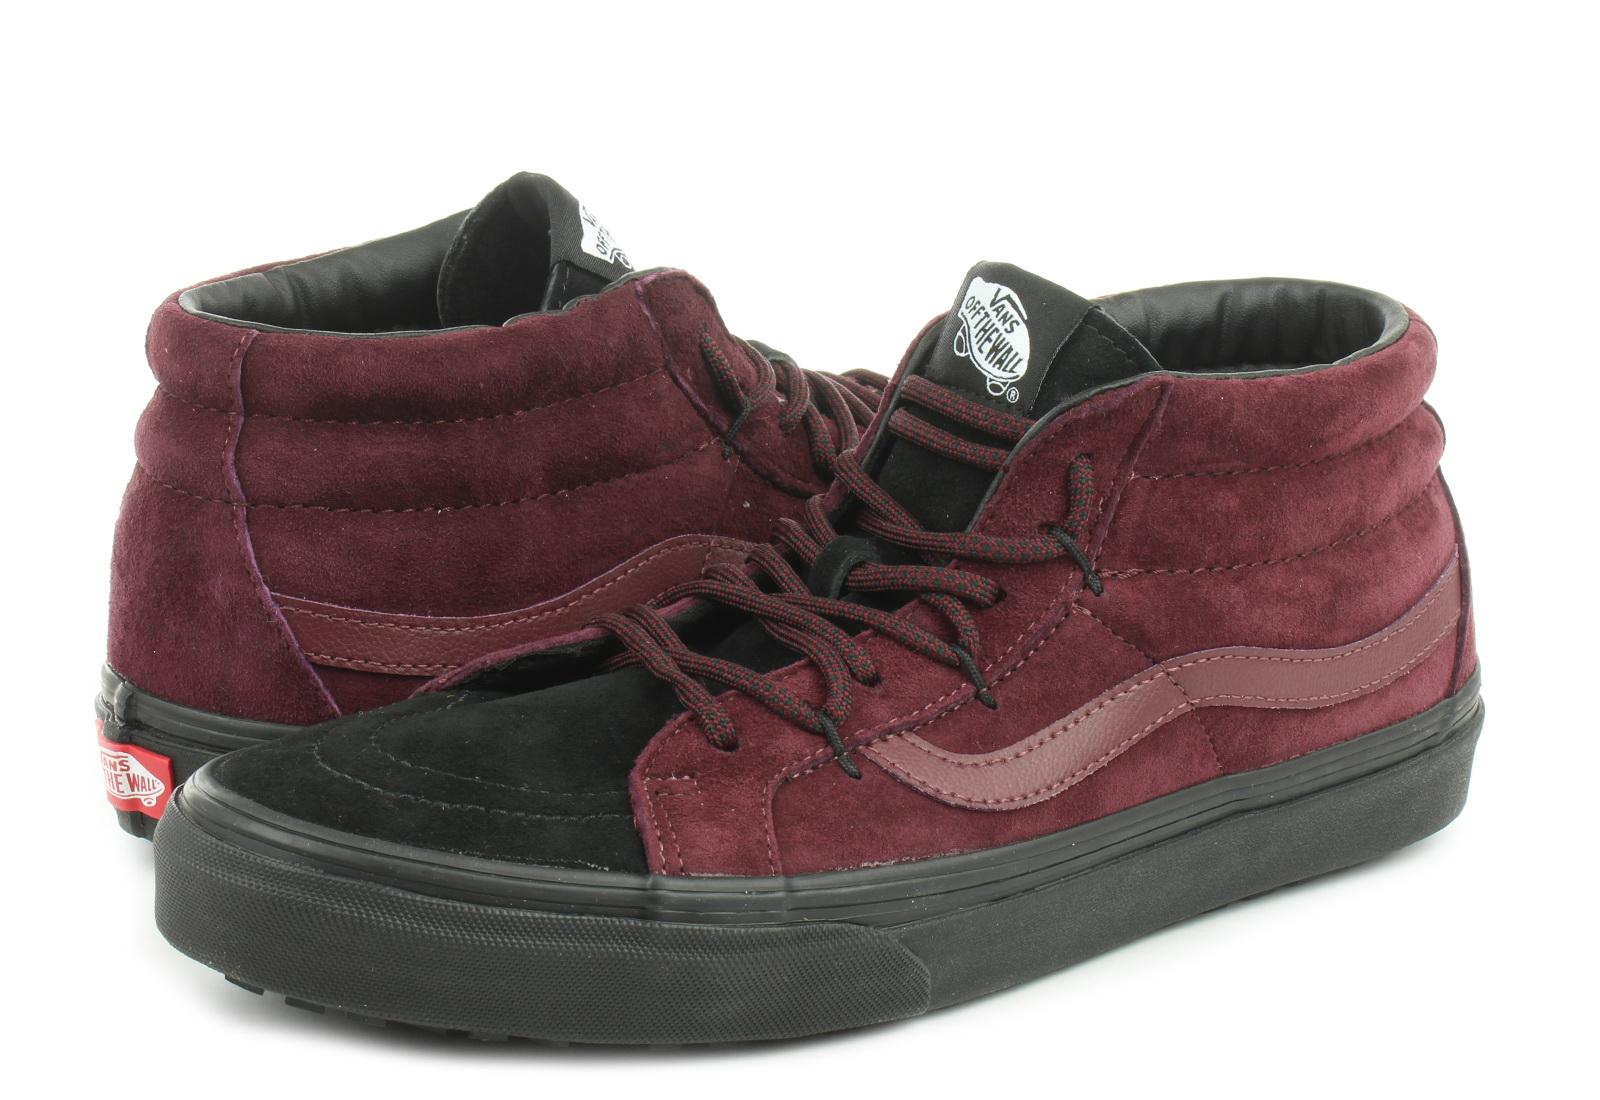 Buty męskie sneakersy Vans Sk8 Mid VA3TKQXKZ | FIOLETOWY